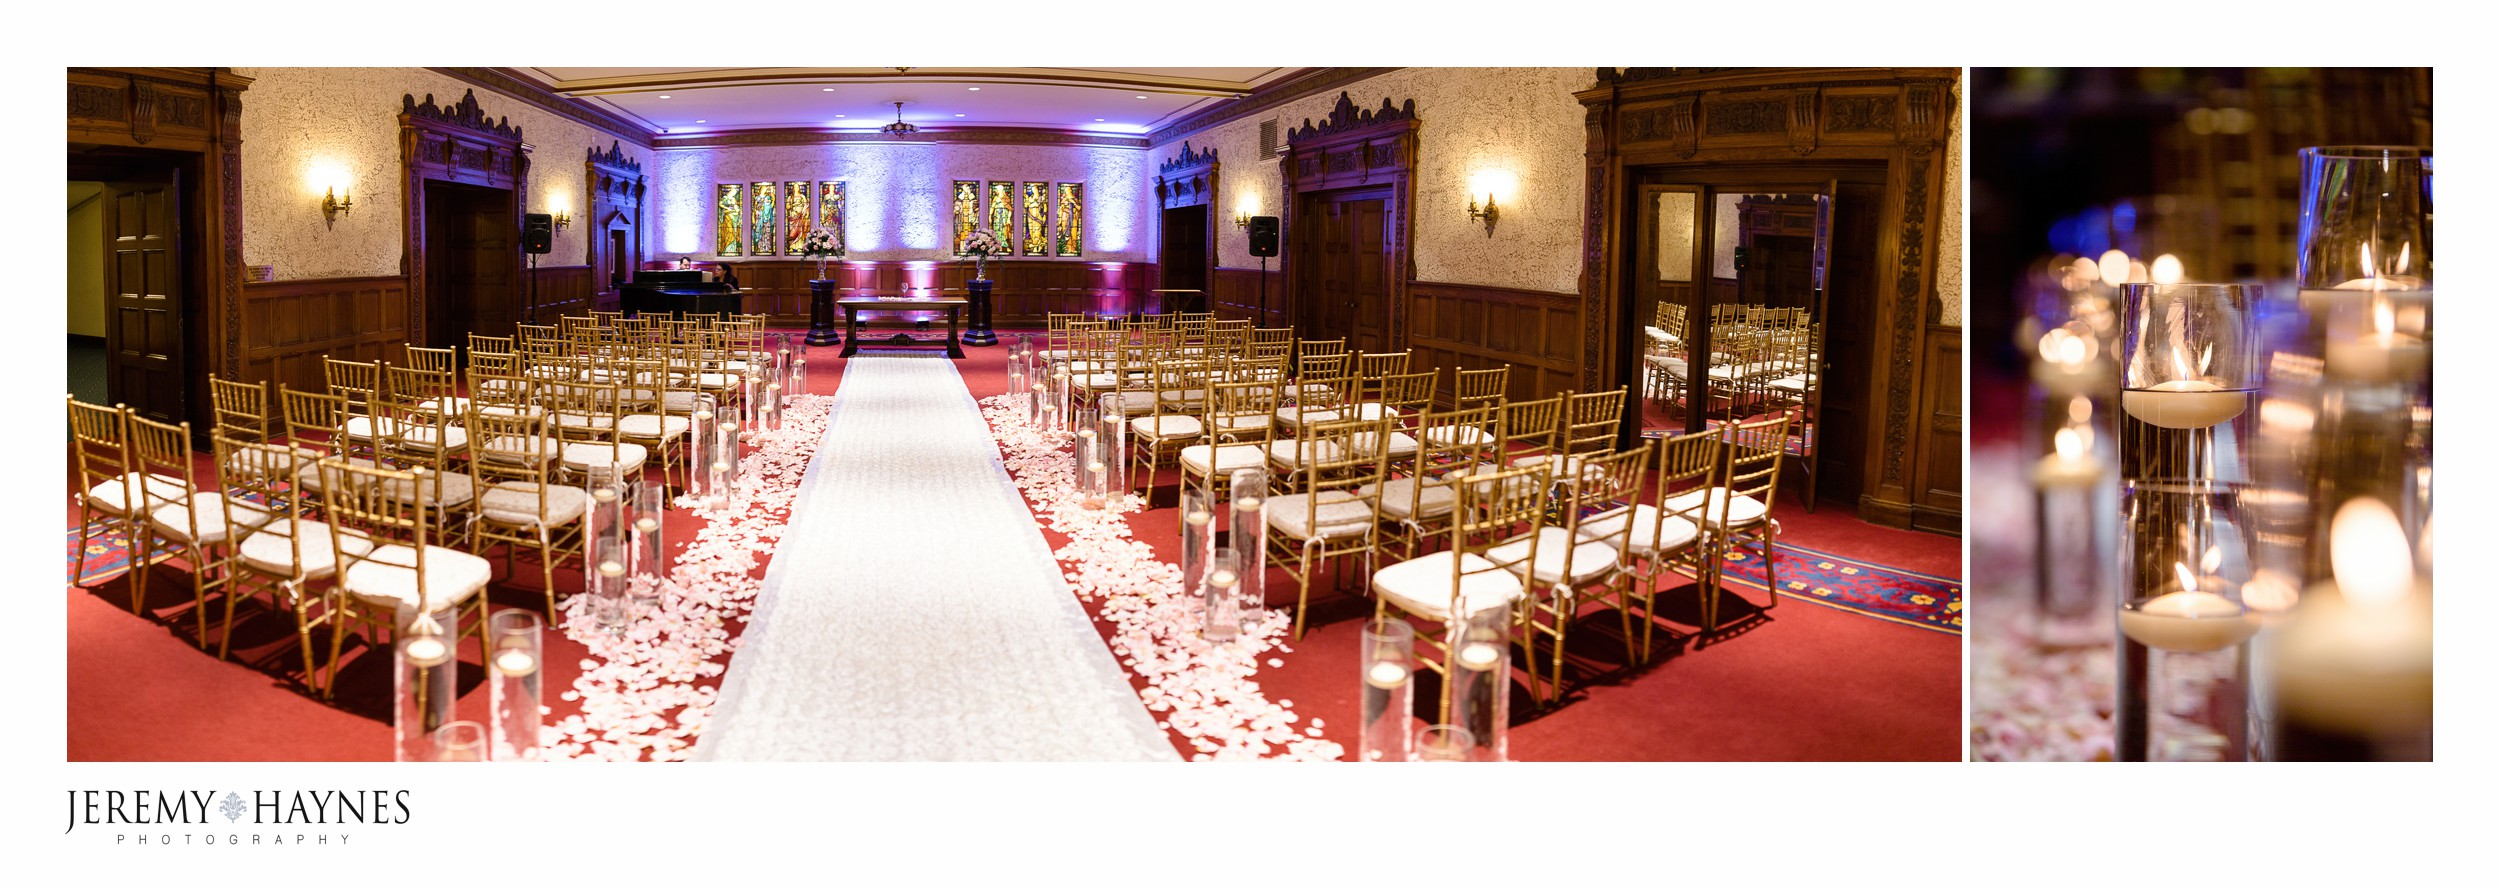 wedding-ceremony-scottish-rite-cathedral.jpg